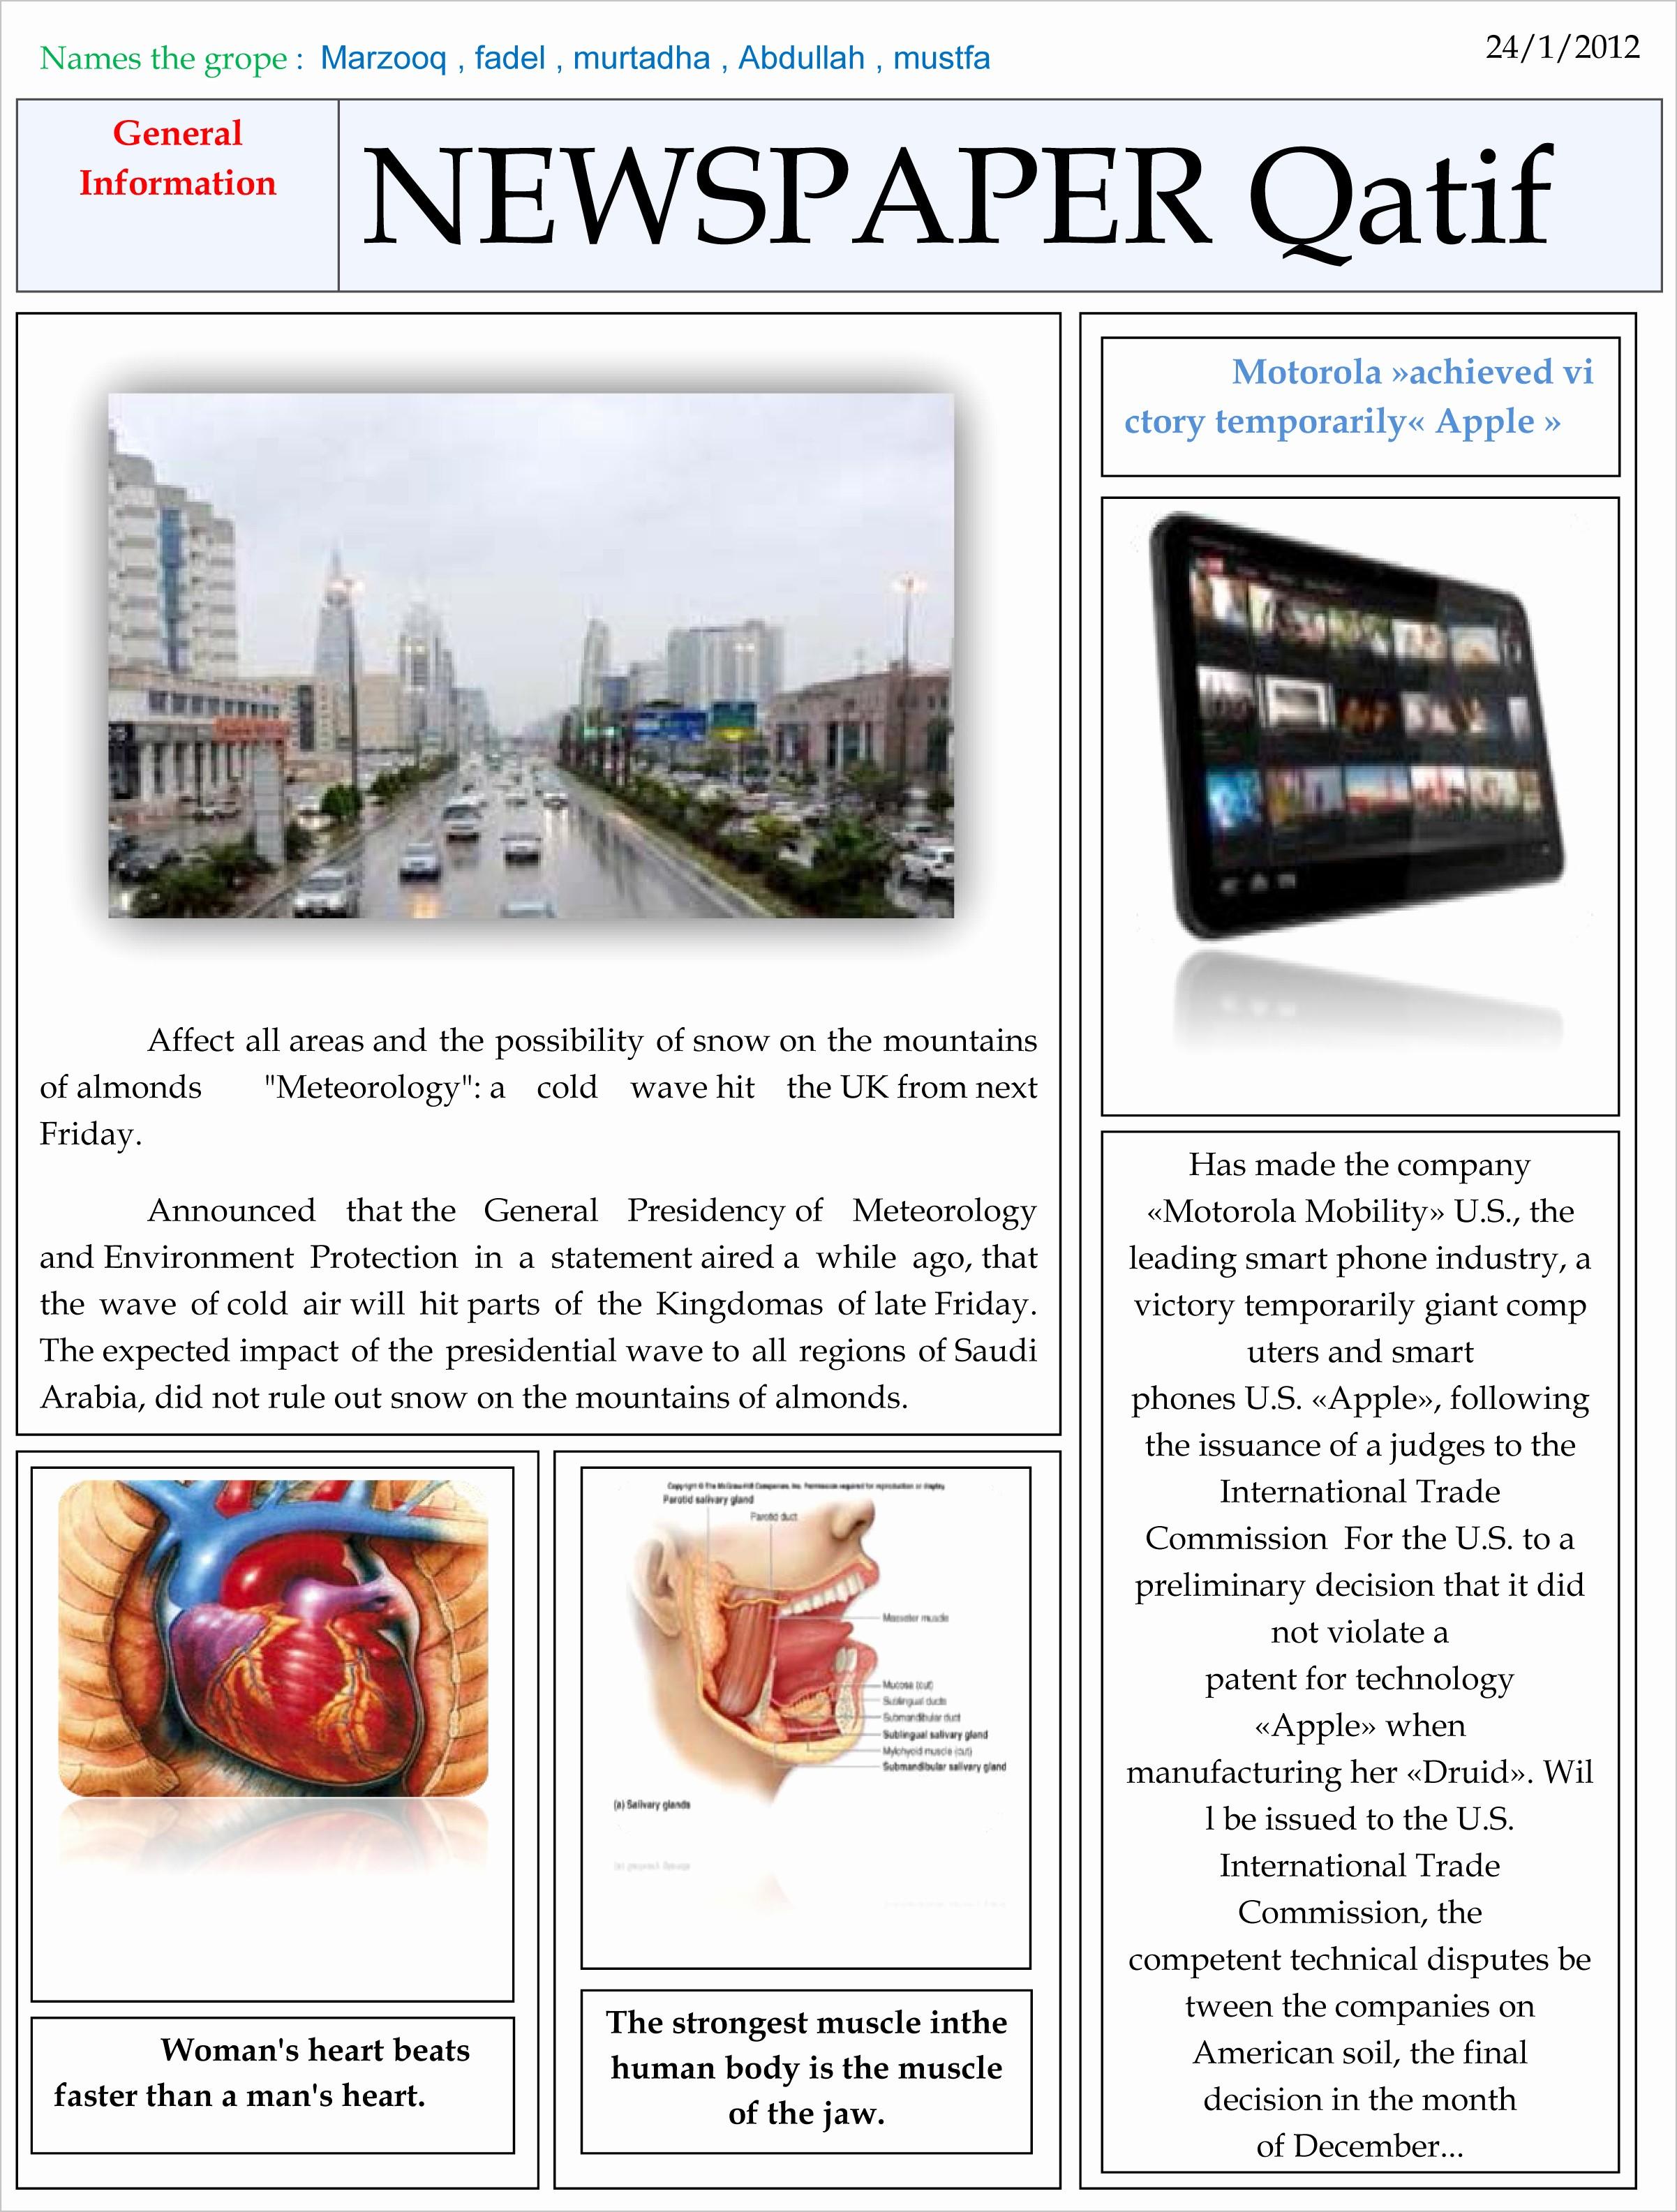 Free Microsoft Word Newspaper Template Lovely Newspaper Qatif